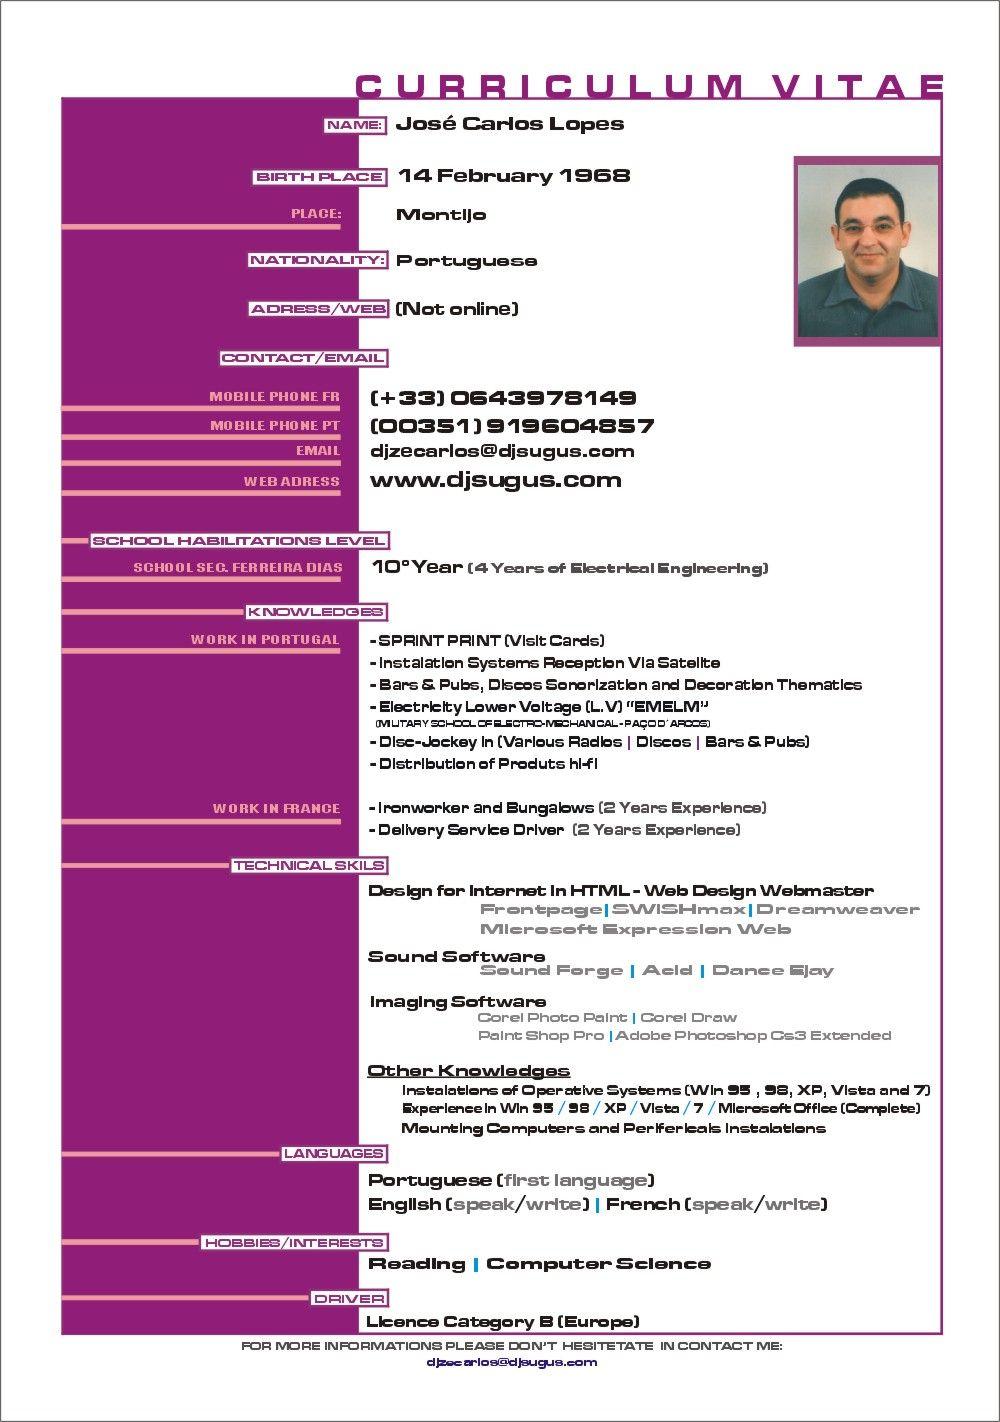 Curriculum Vitae Modelos En Espanol 13 | Cosas para comprar ...